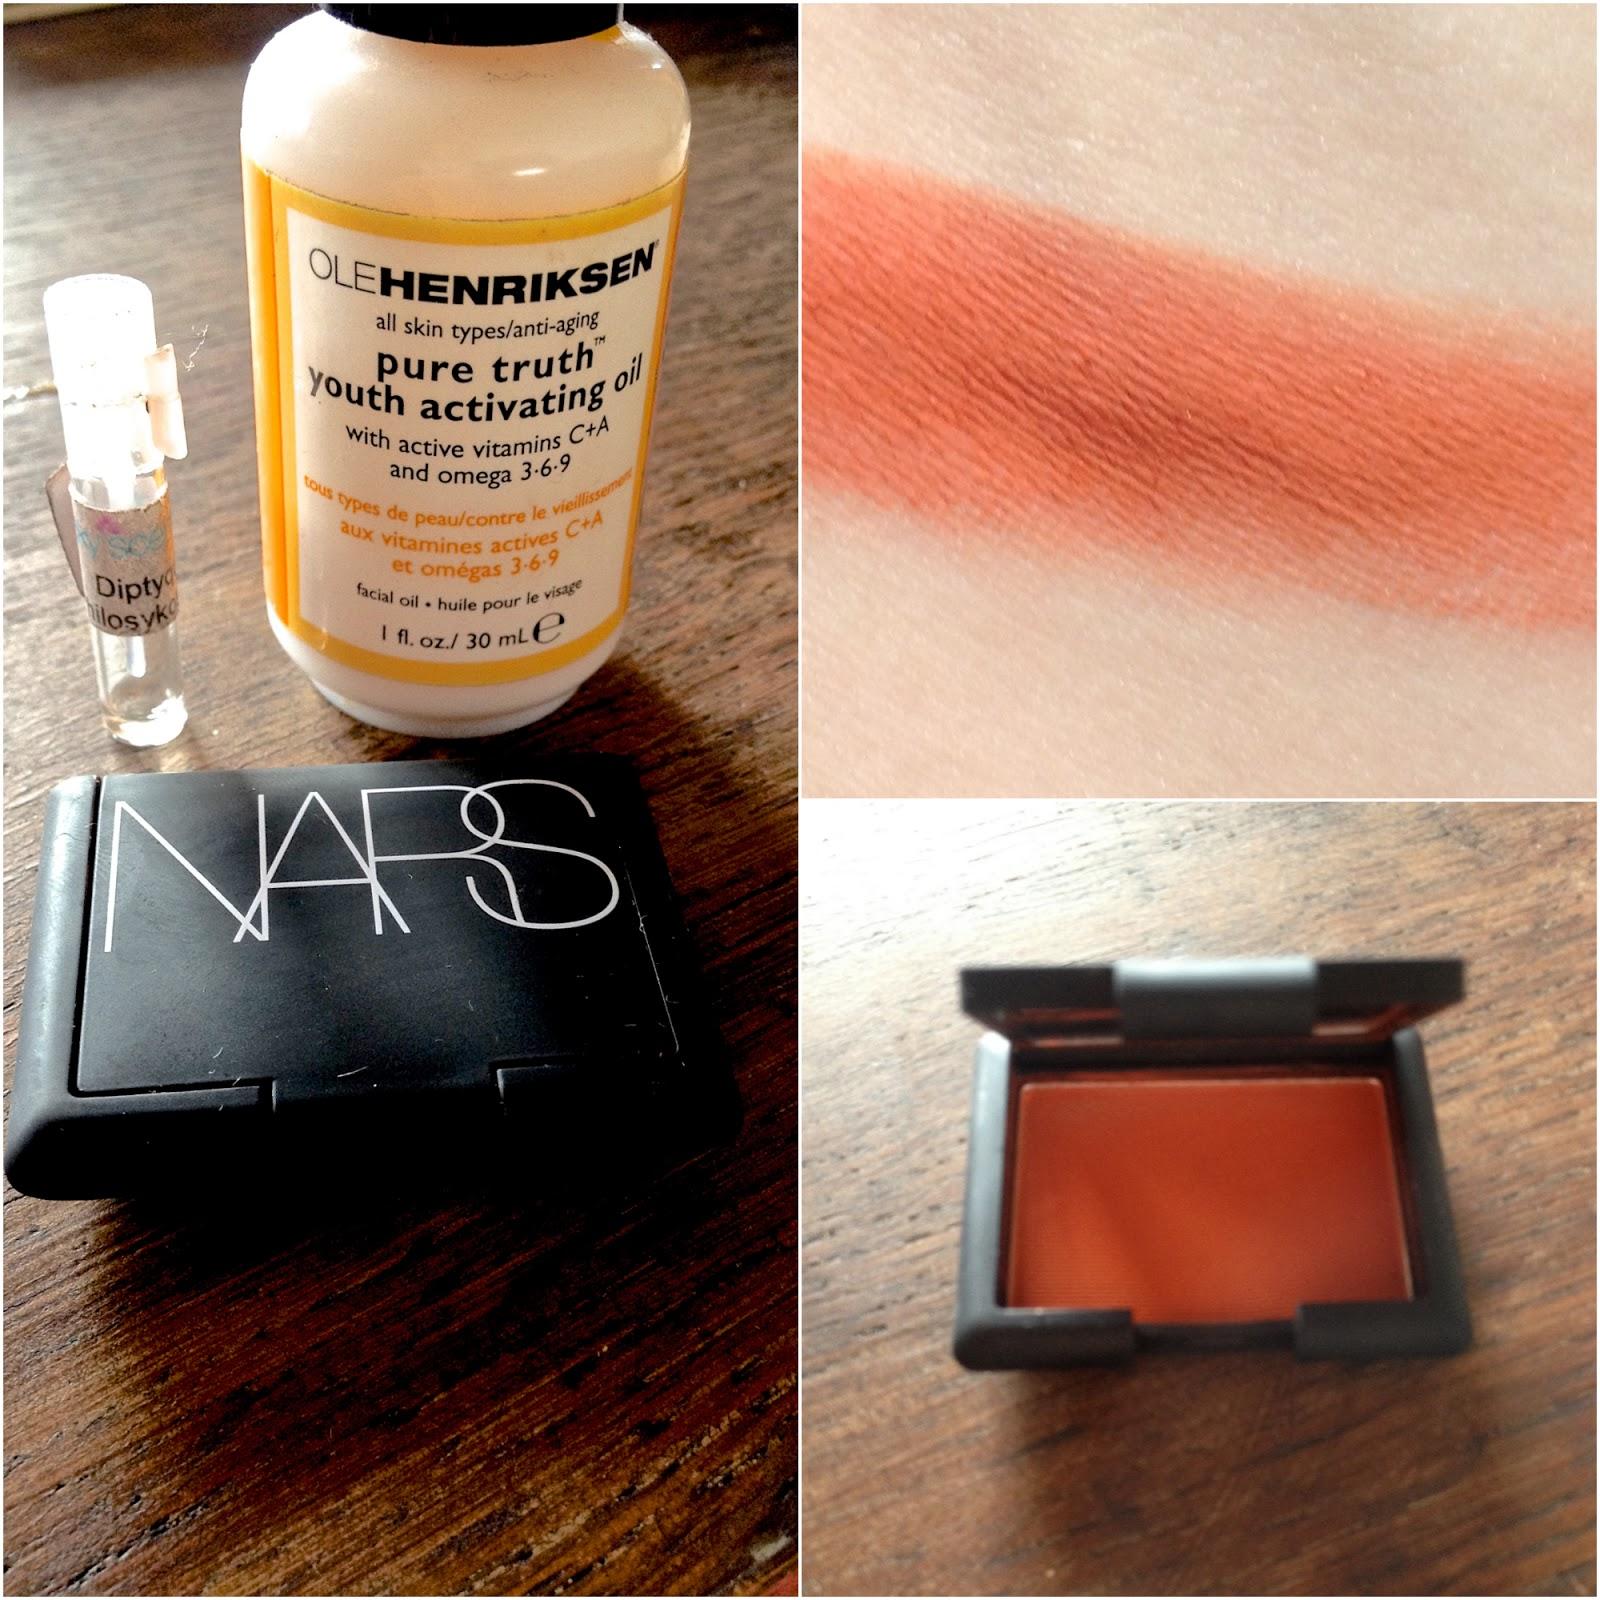 perfume, orange, eye shadow, skin care, oils, Vitamin C, review